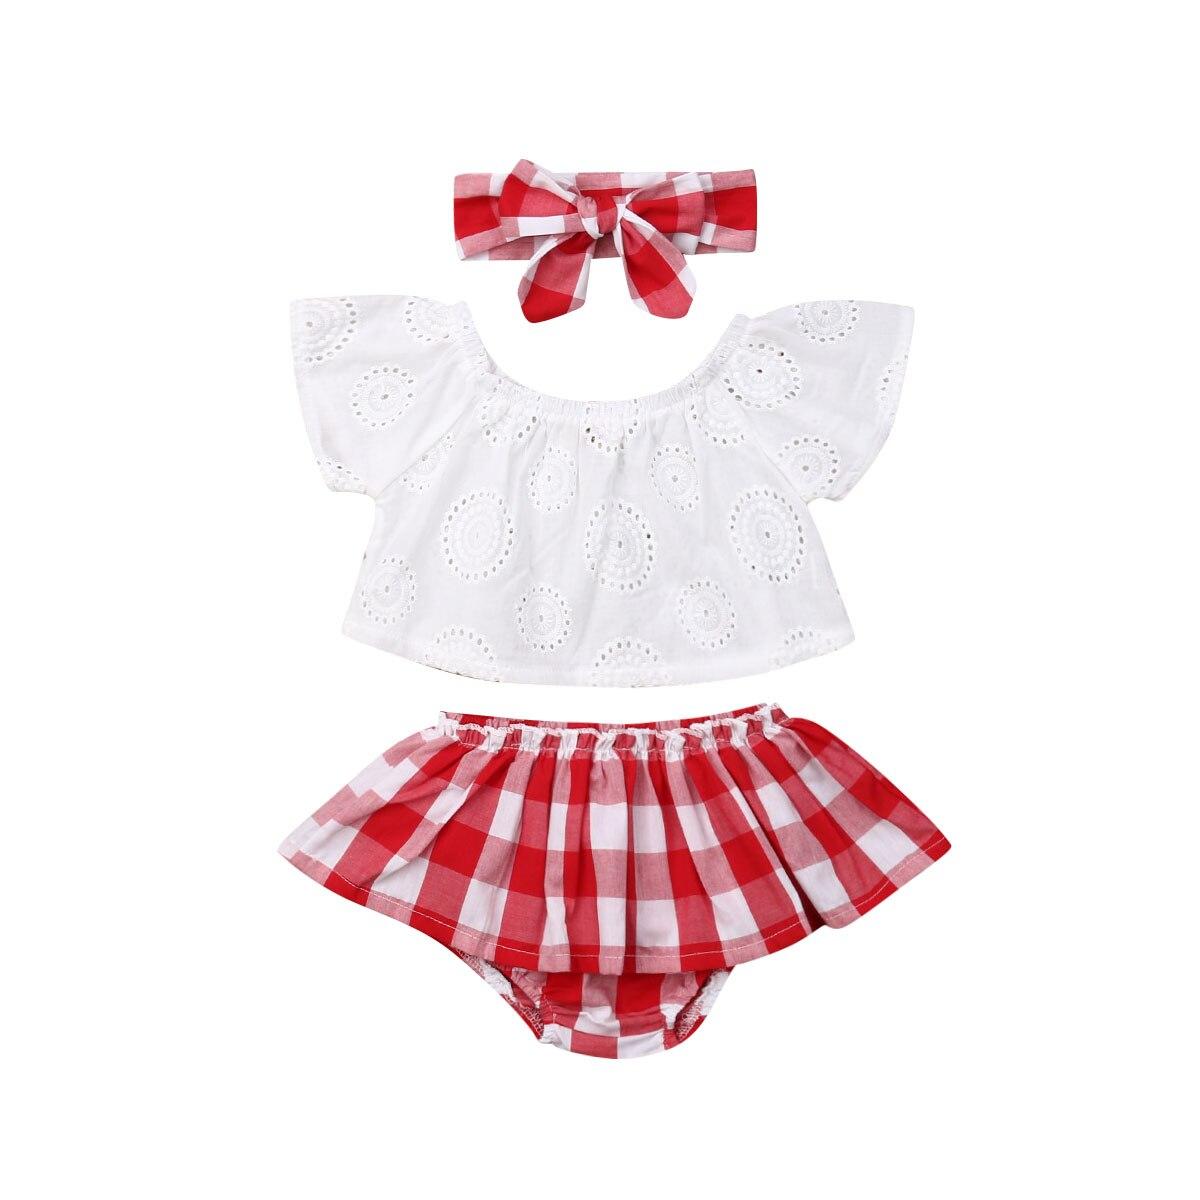 Newborn Baby Girl Summer Plaid Clothes Sets 0-24M White T Shirts Tops+Ruffles Shorts+Headband 3pcs